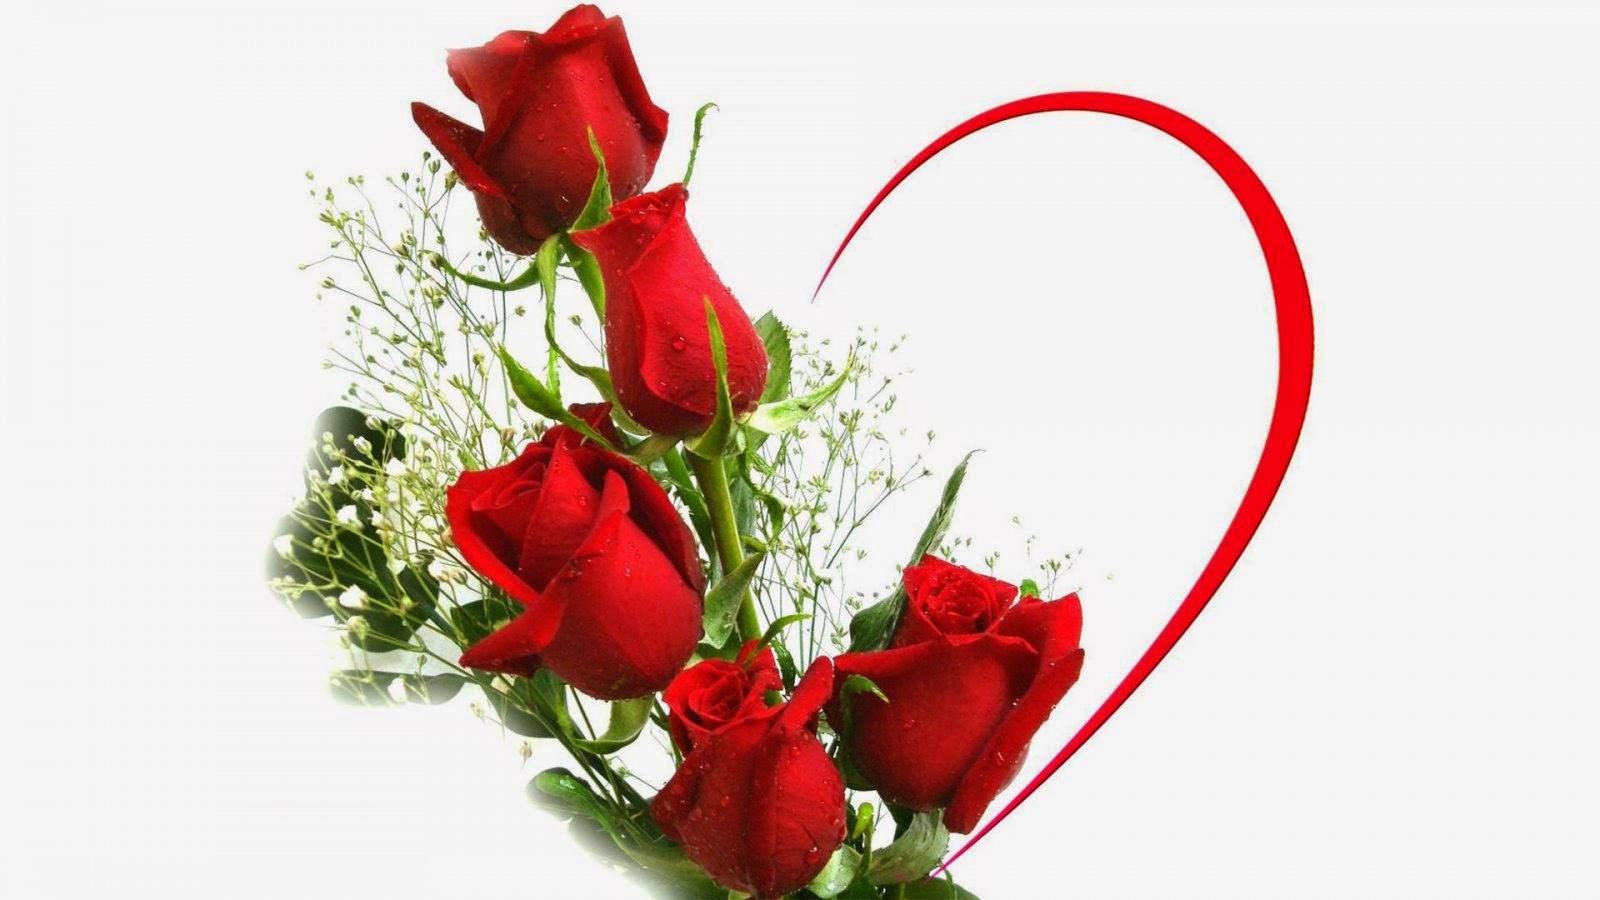 Imagenes de San Valentin, parte 5